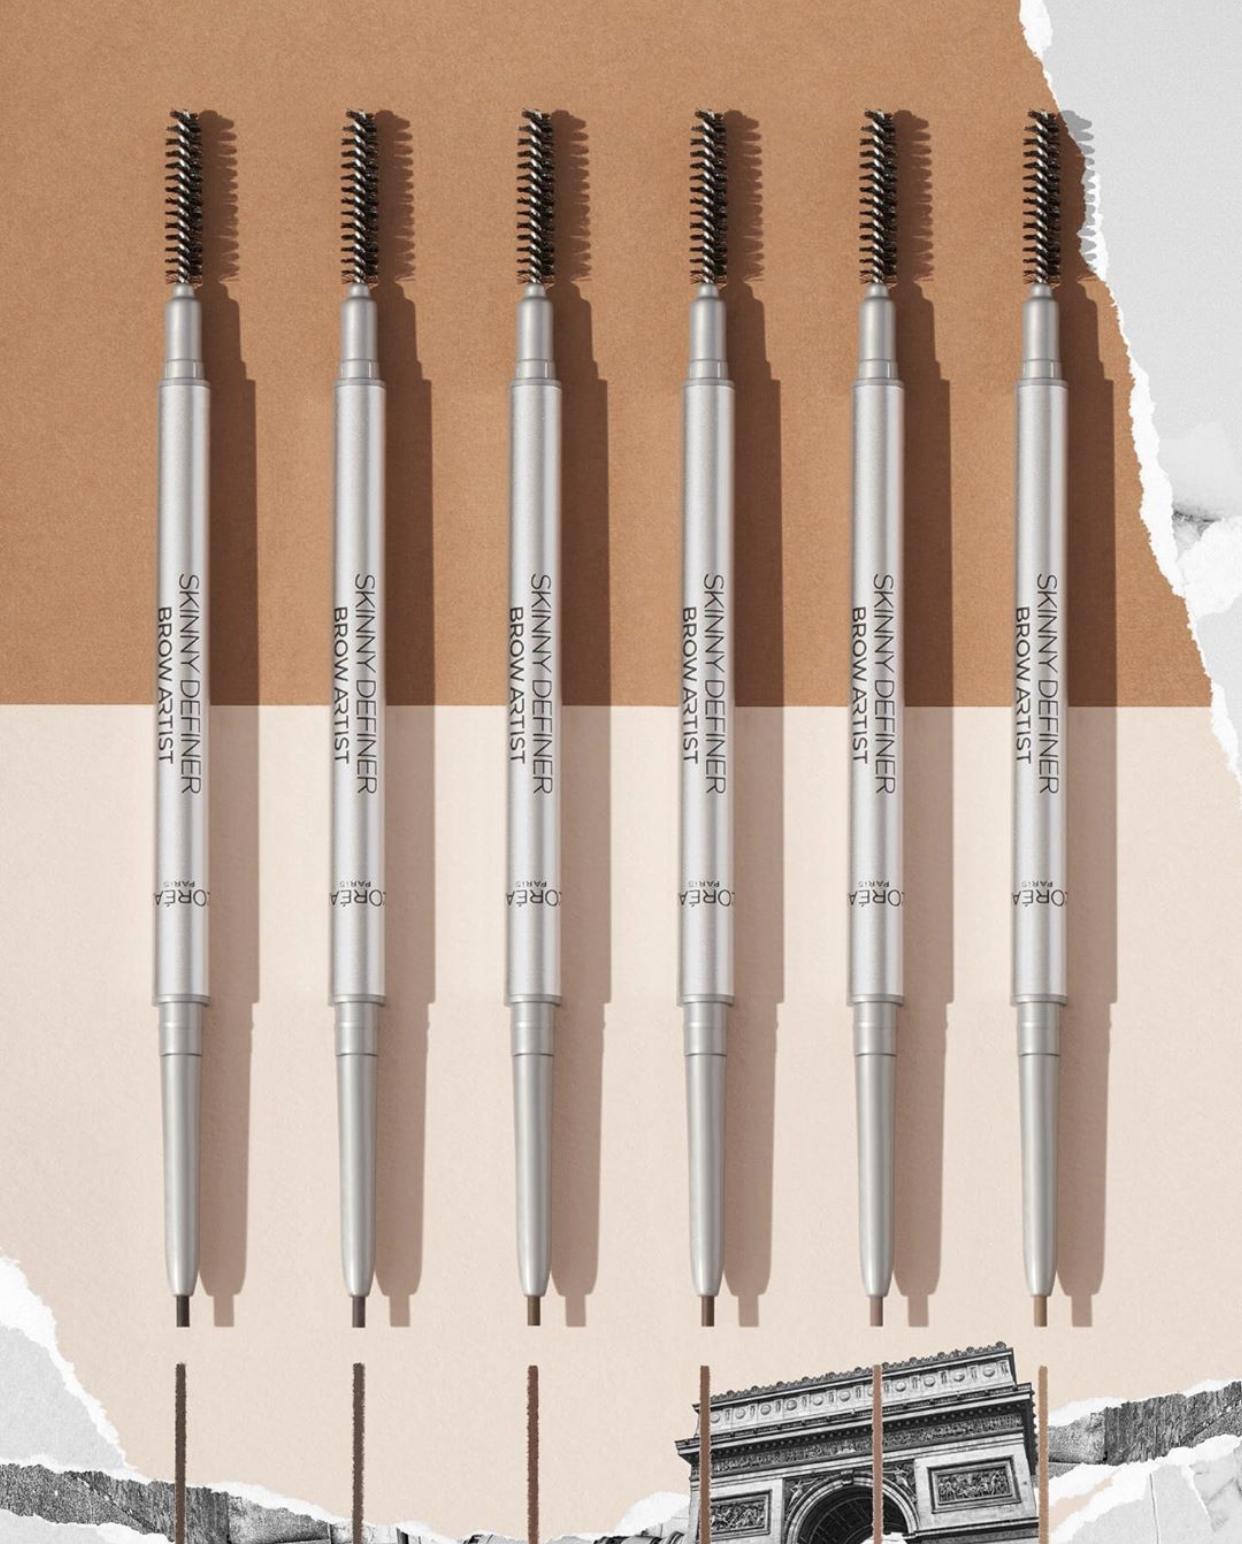 L'Oreal Brow Artist Skinny Definer Brow Pencil